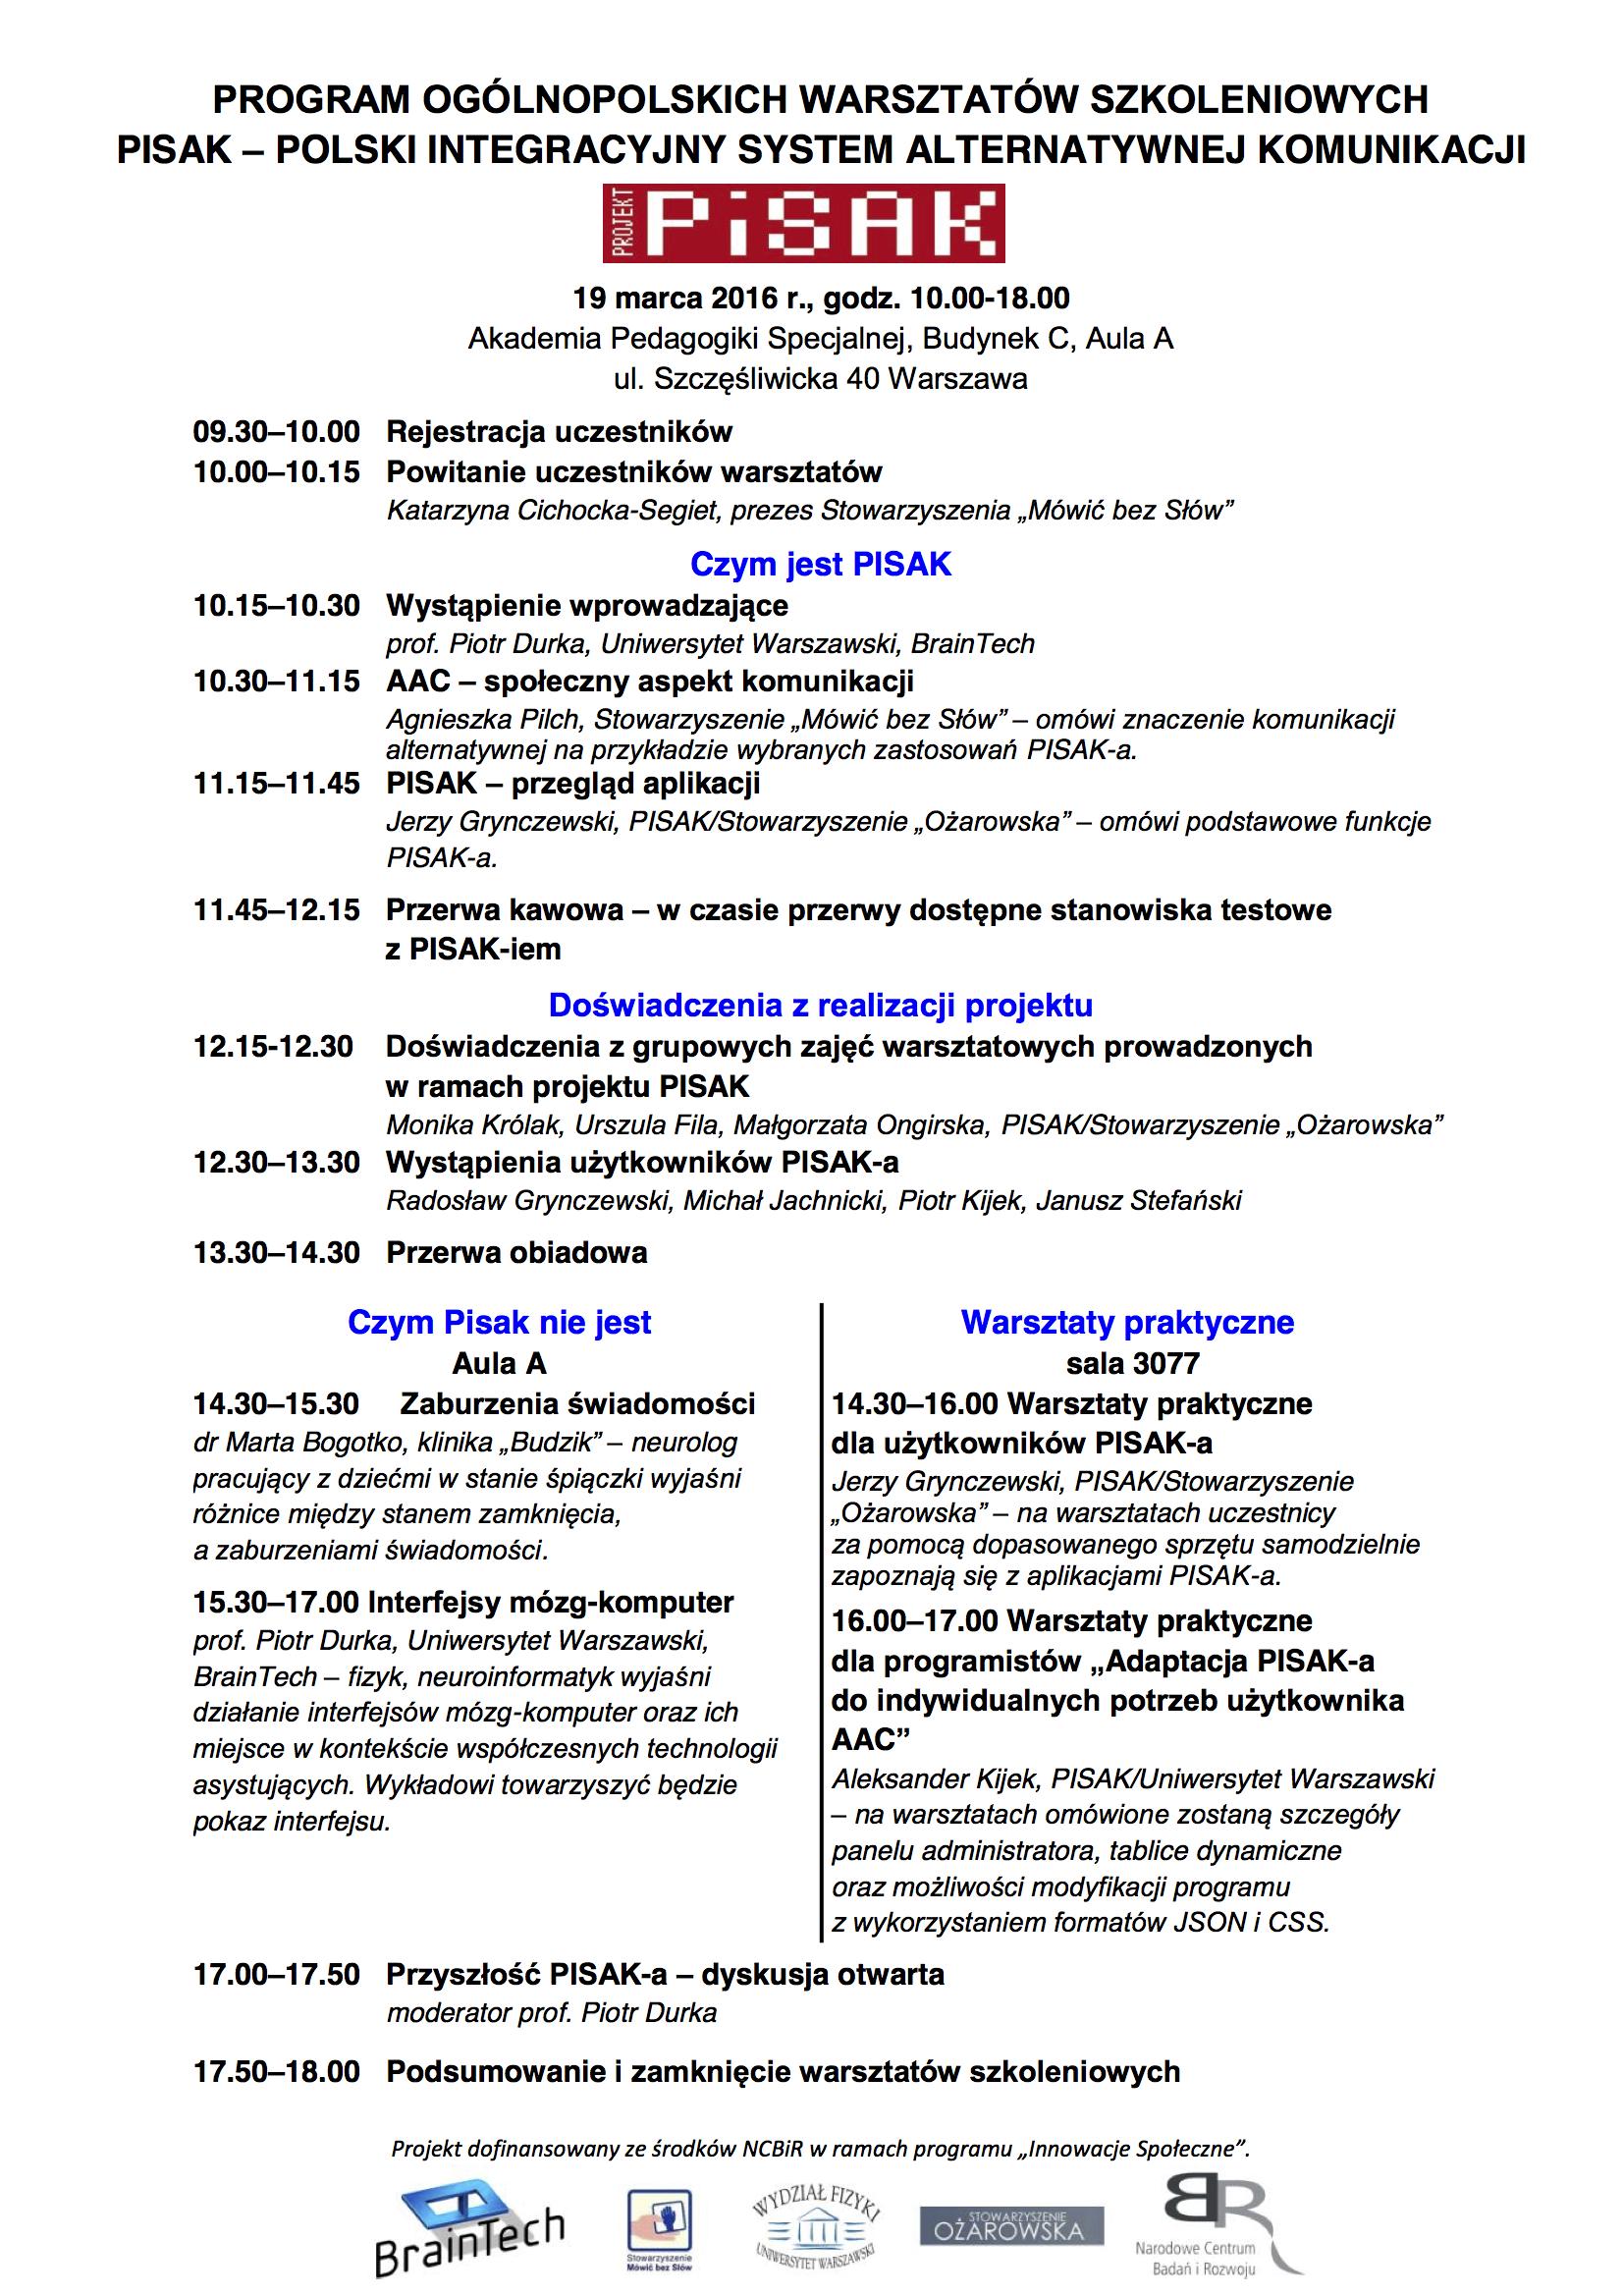 PISAK.warsztaty2016.program_txt